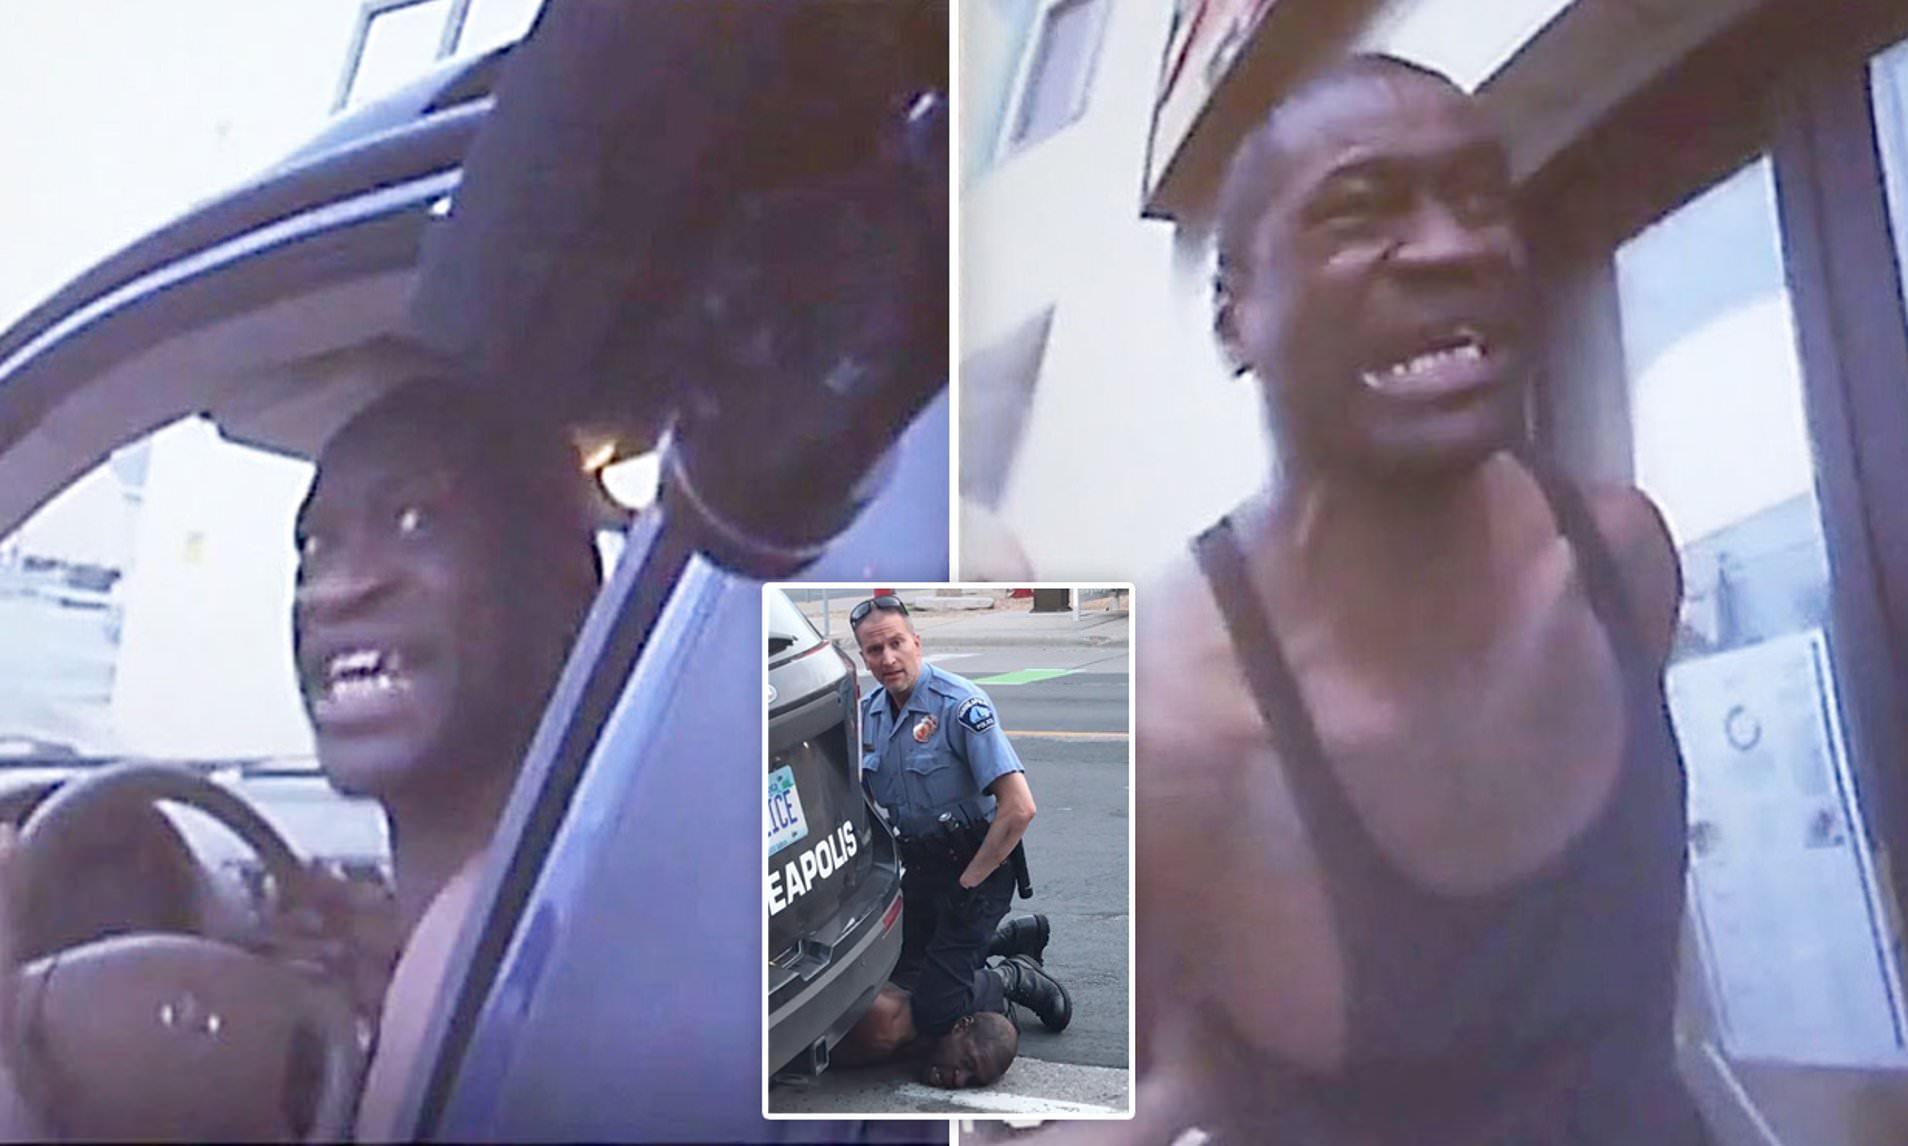 Leaked Police Bodycam Footage Showing George Floyd Resisting Arrest, Debunks 'Racism' Narrative 1